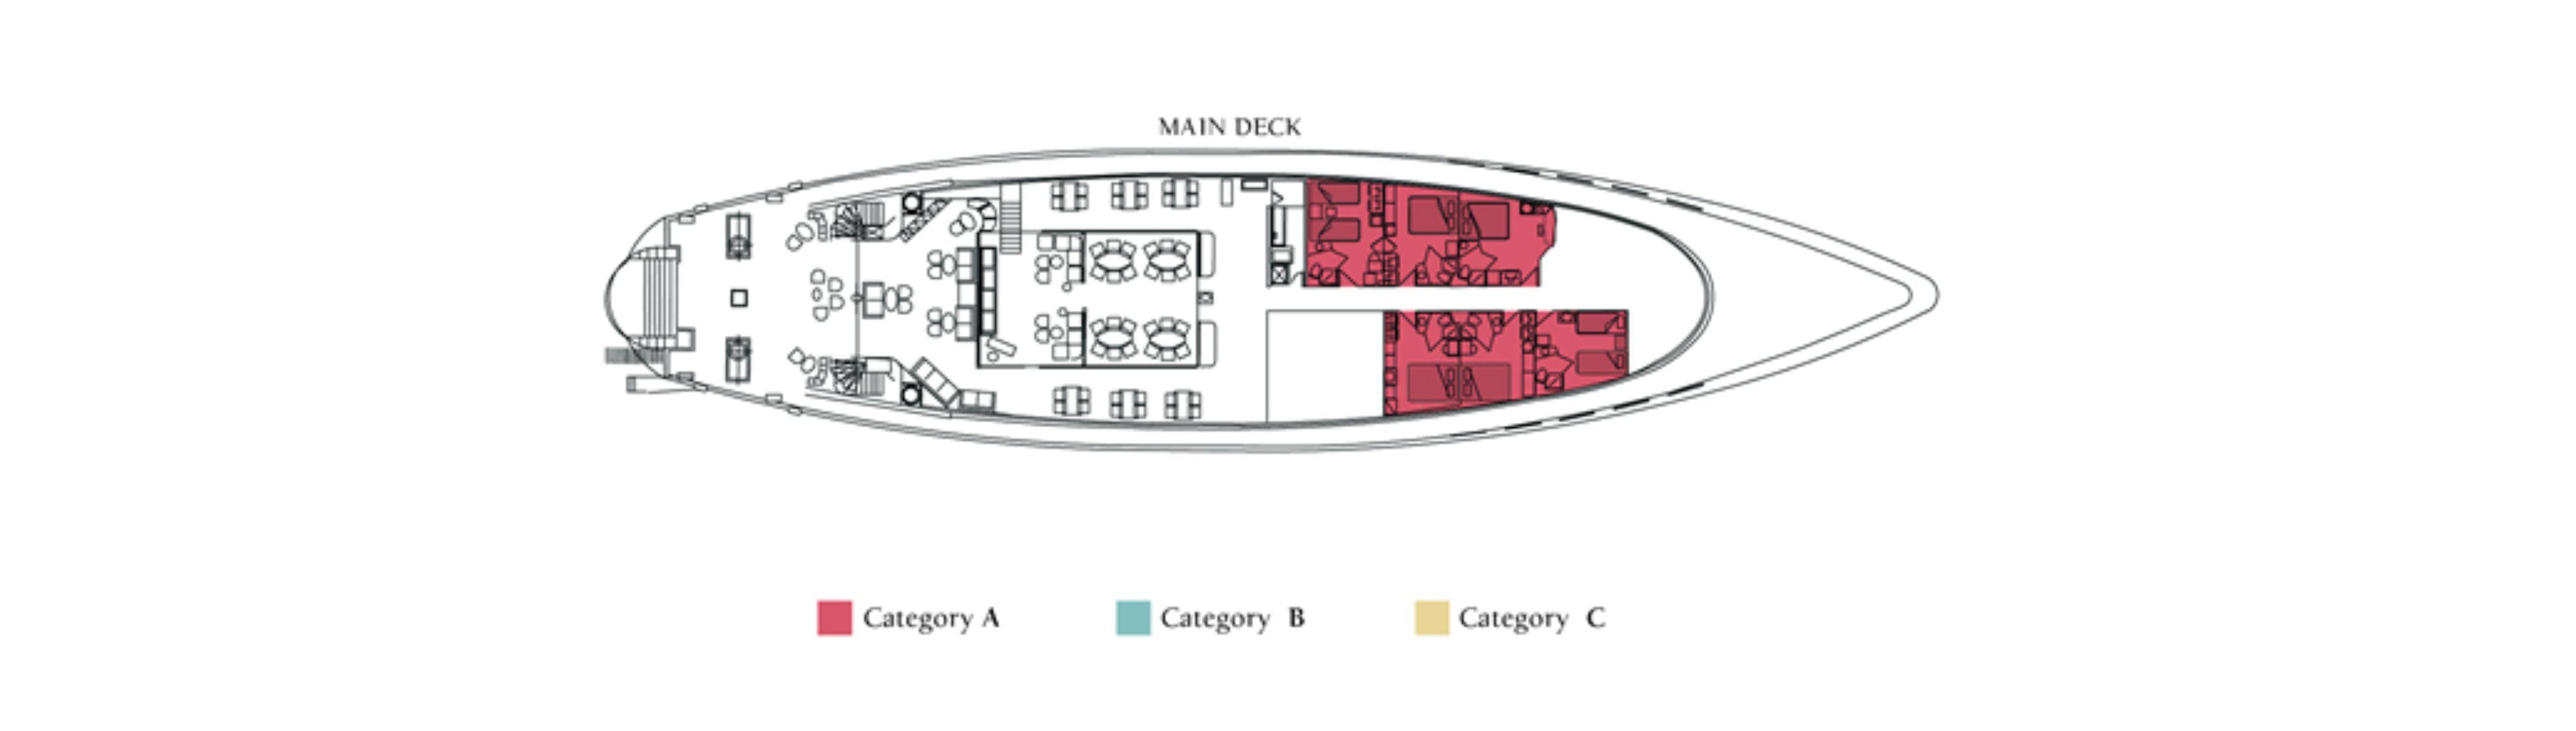 M/S Panorama, Main Deck